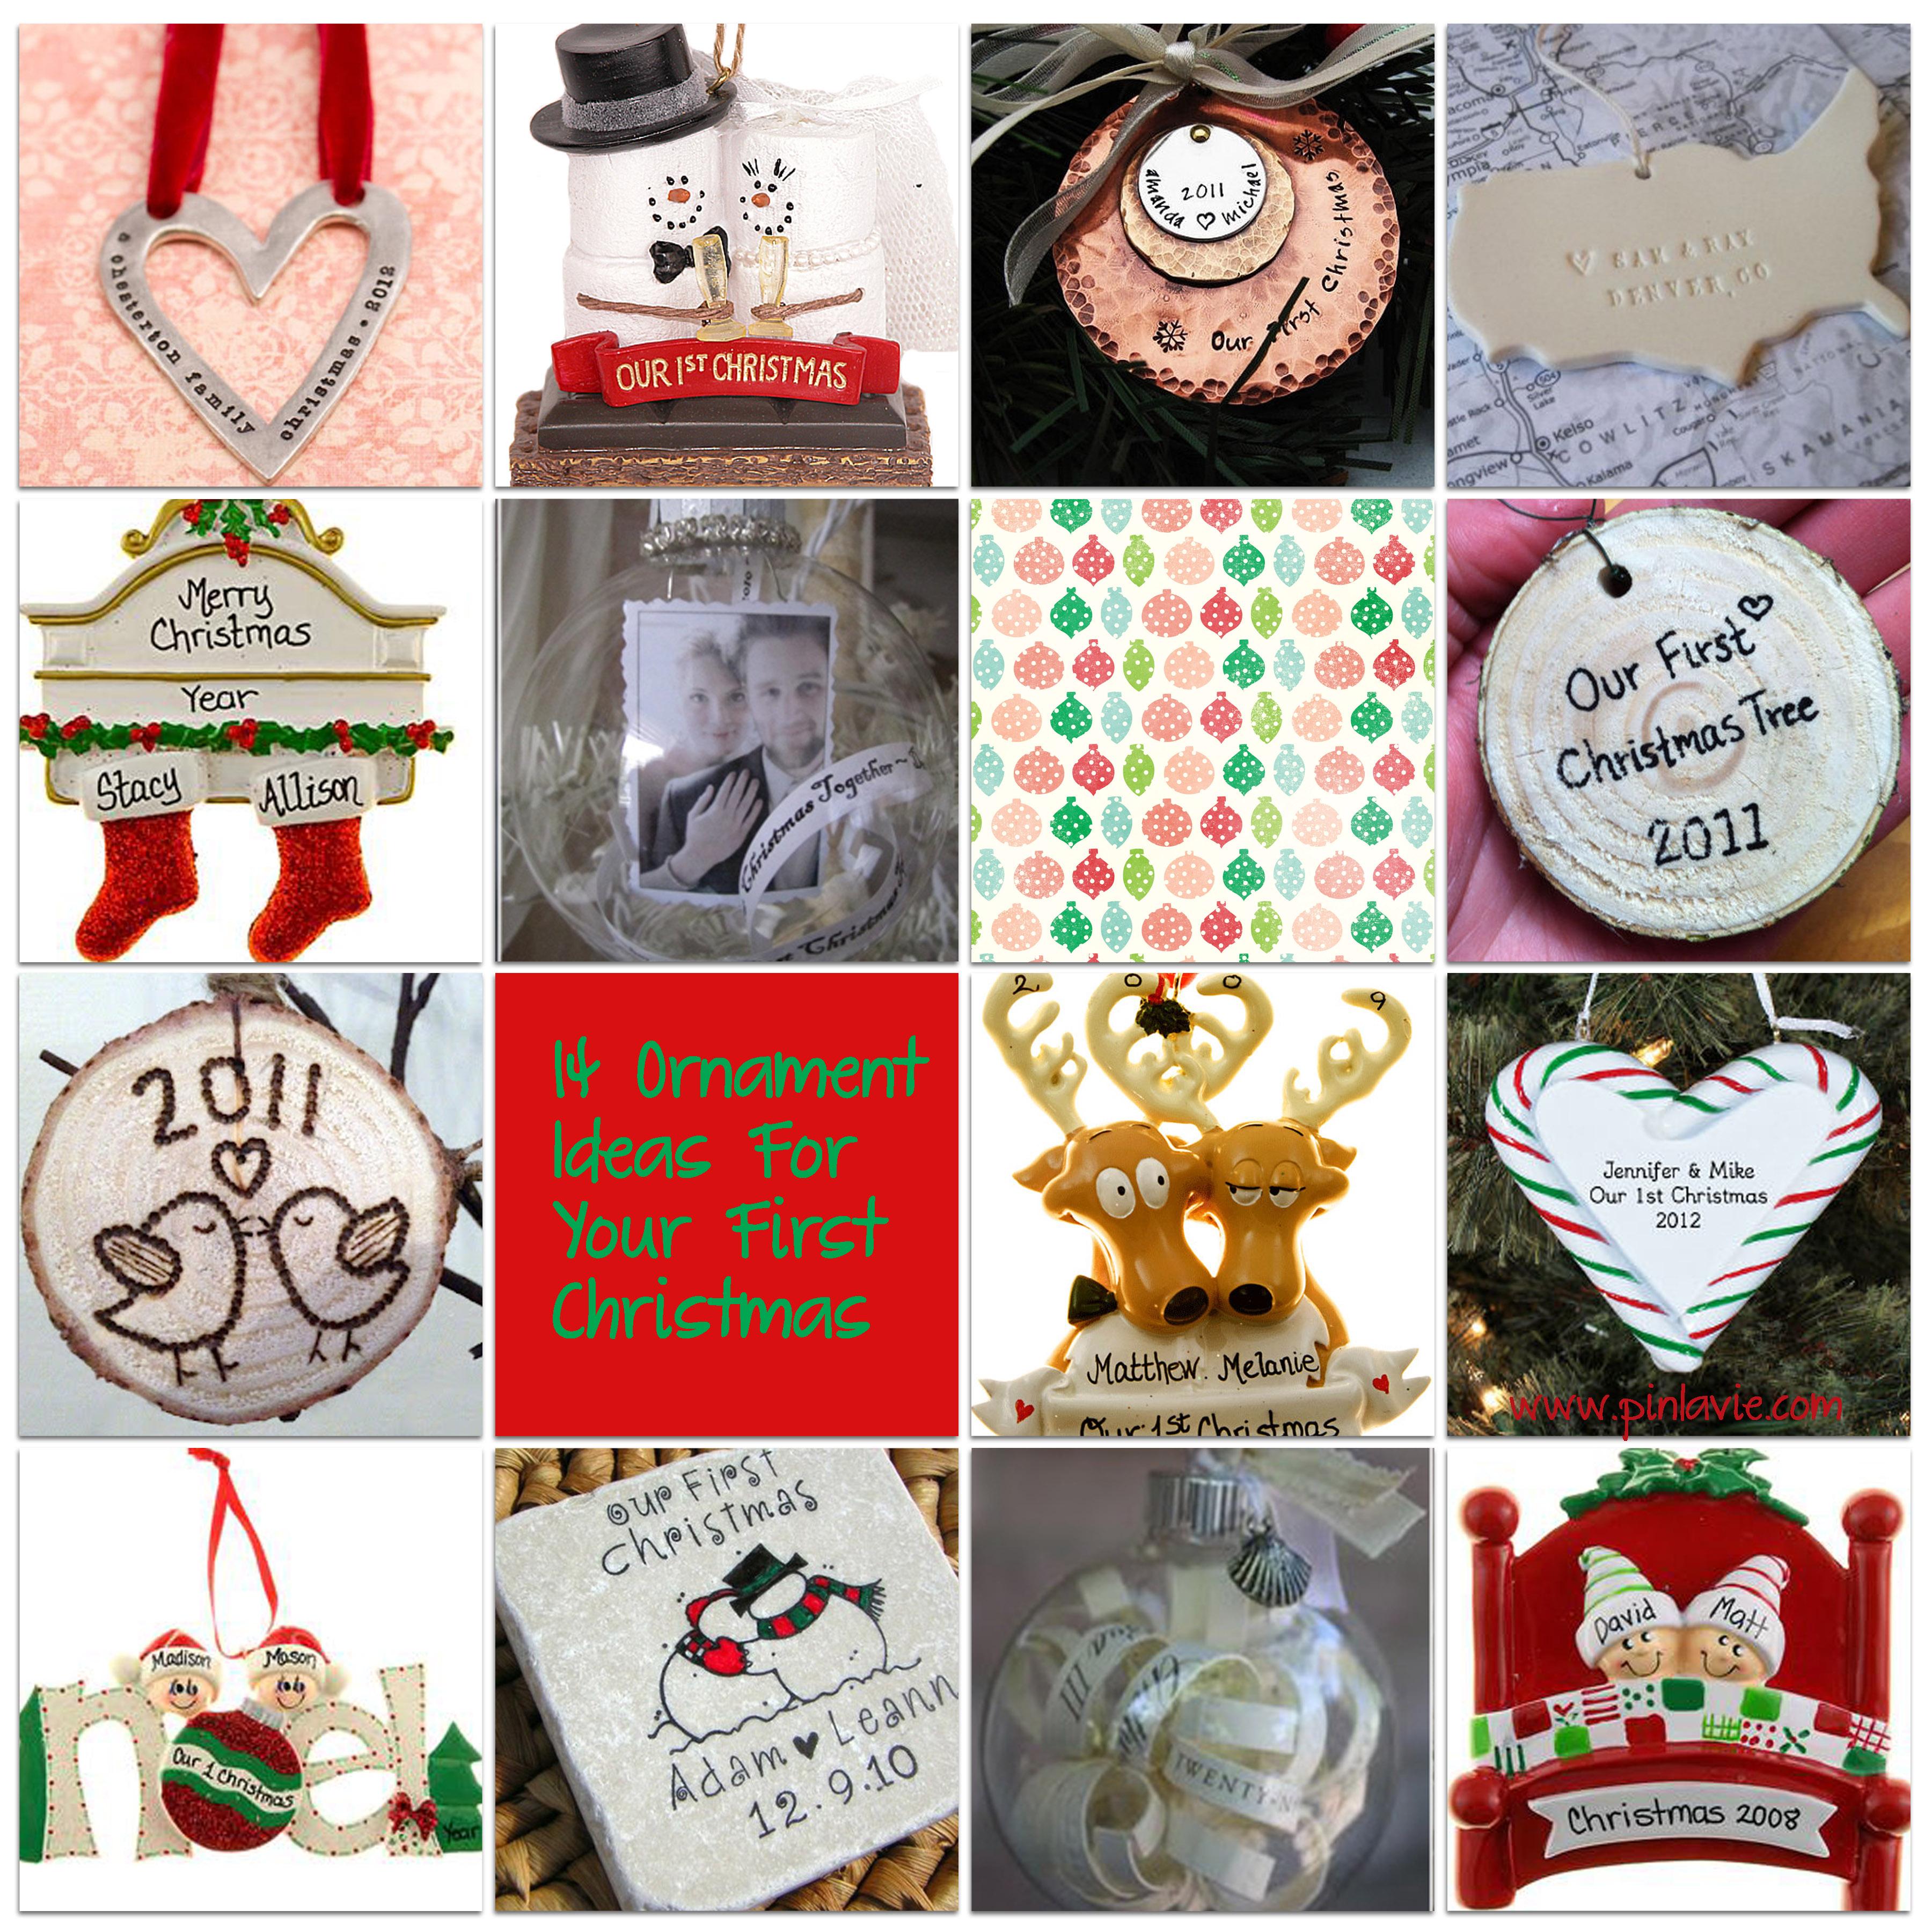 14 Ornament Ideas For Your First Christmas – PinLaVie.com